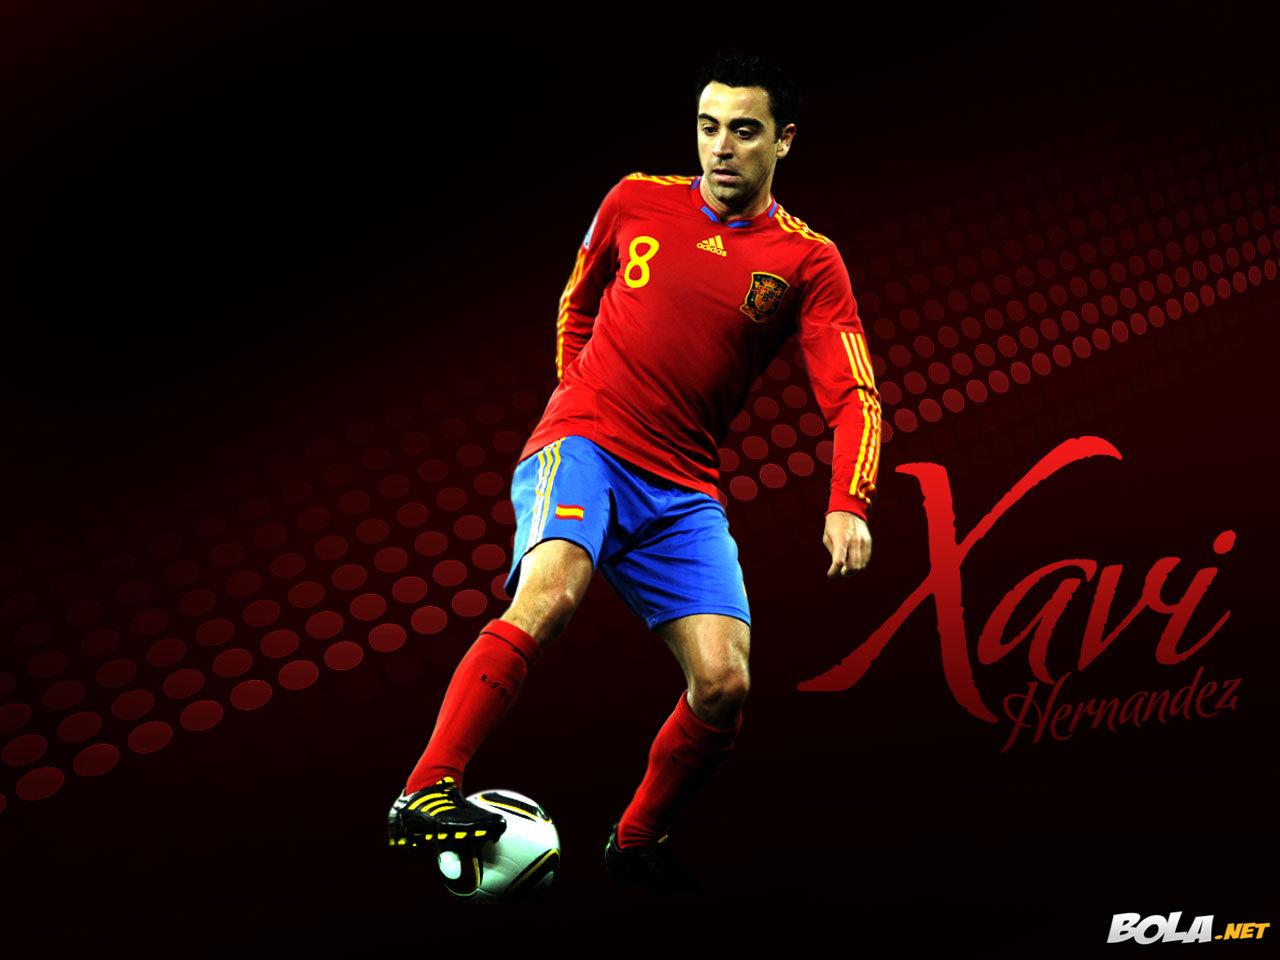 Football Stars Xavi Hernandez 2011 Wallpapers 1280x960